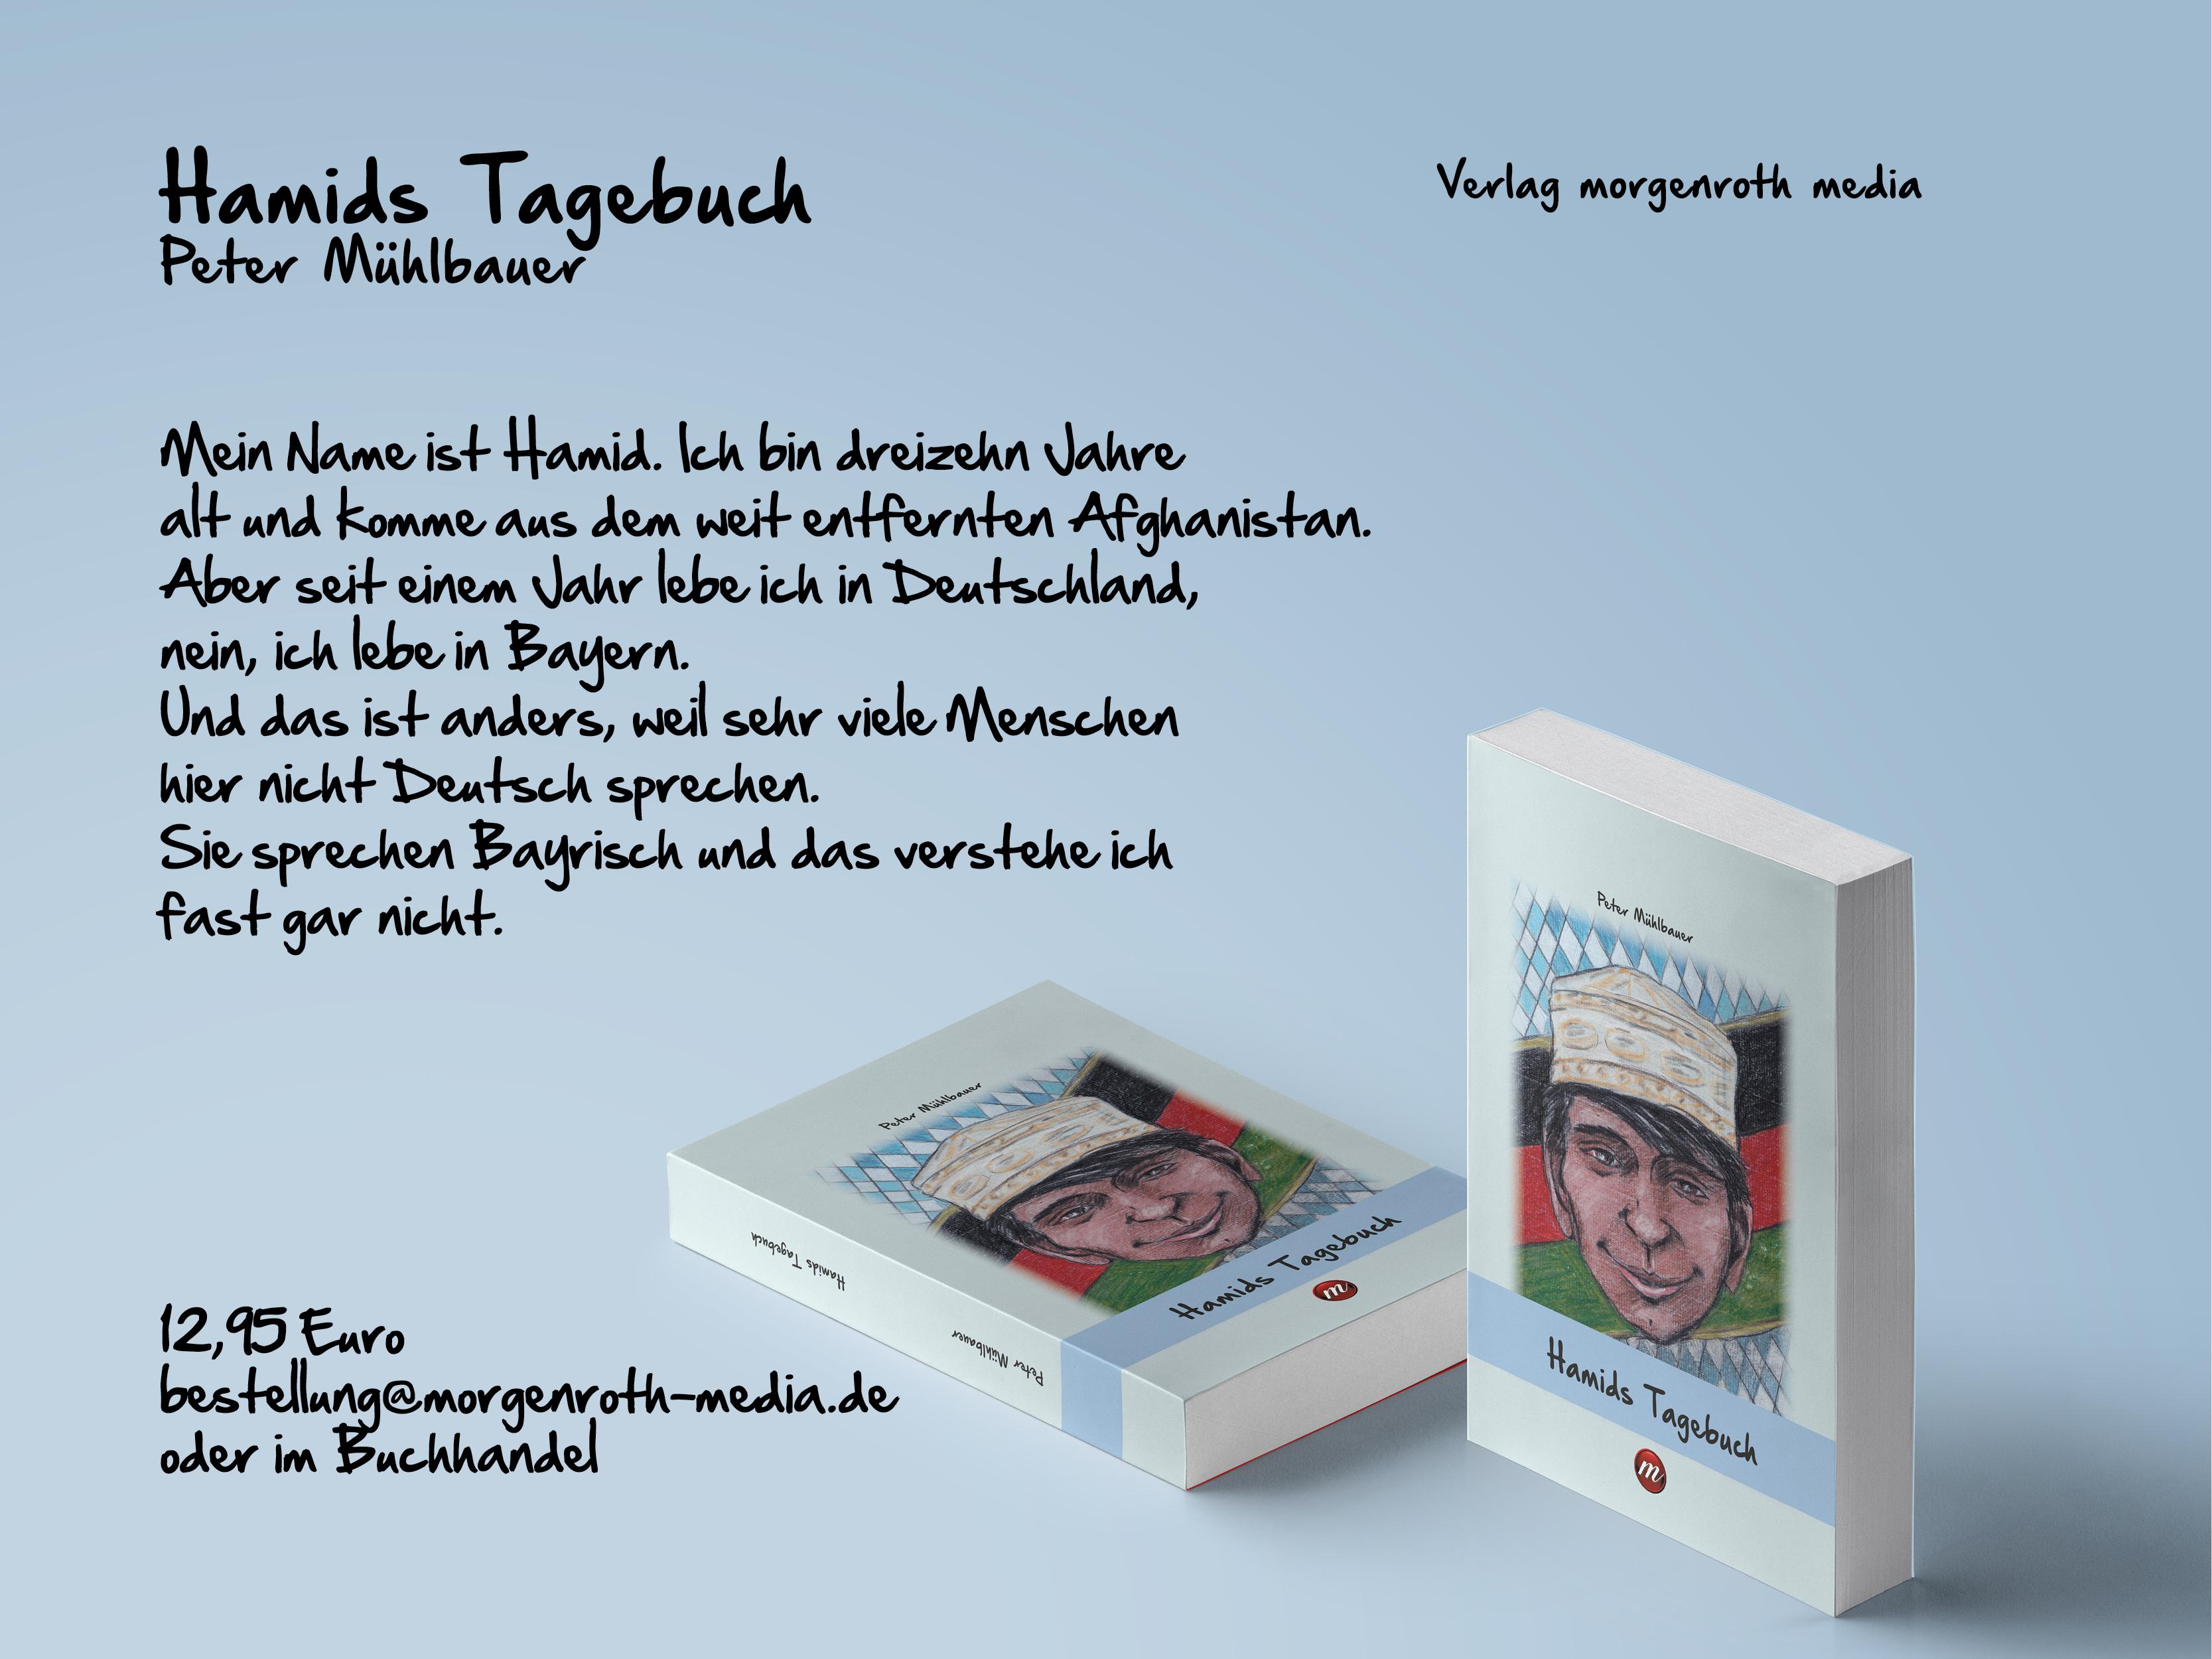 Hamids Tagebuch